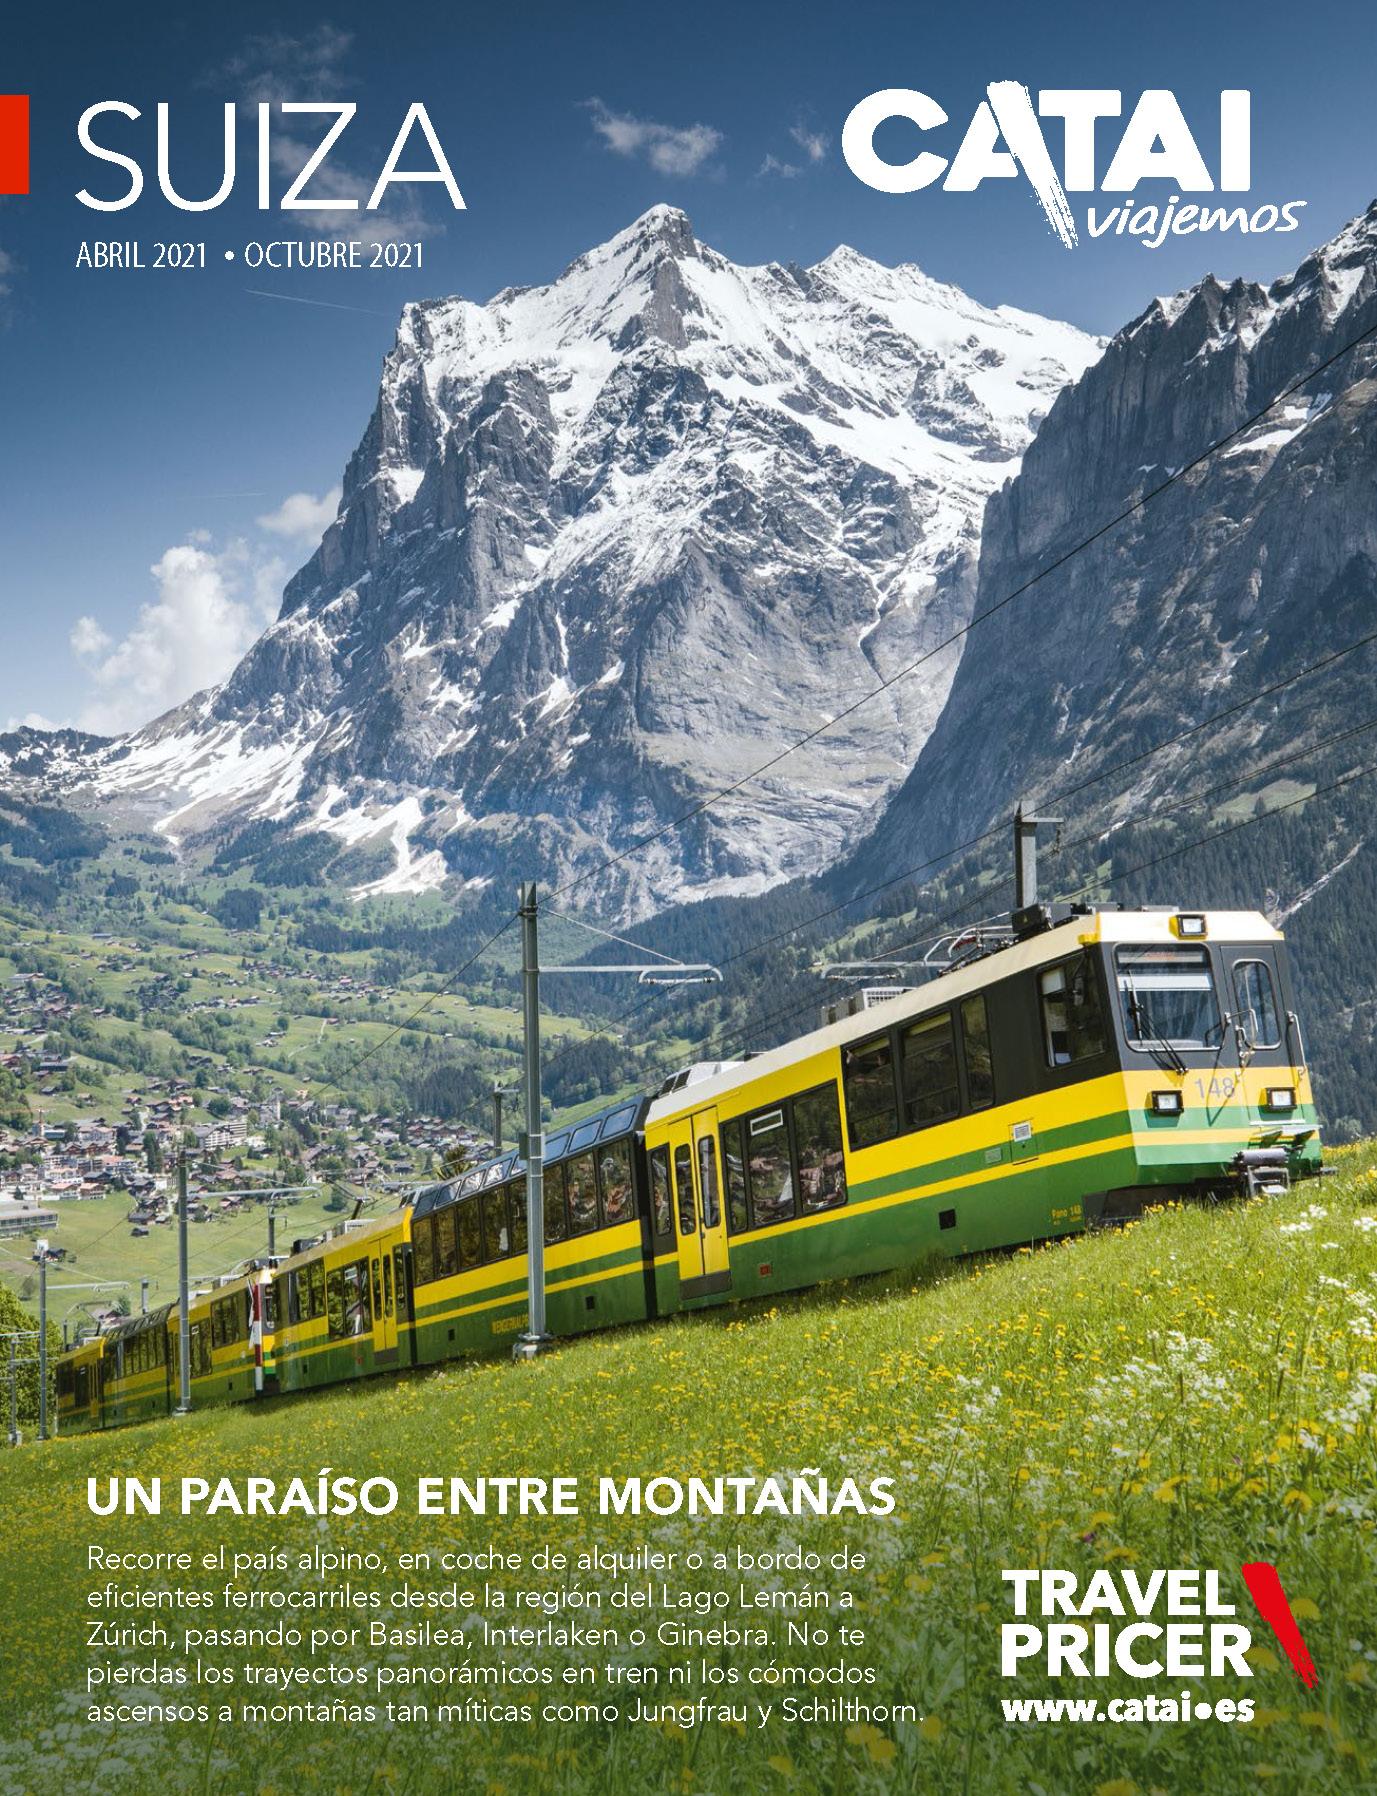 Catalogo Catai Suiza 2021